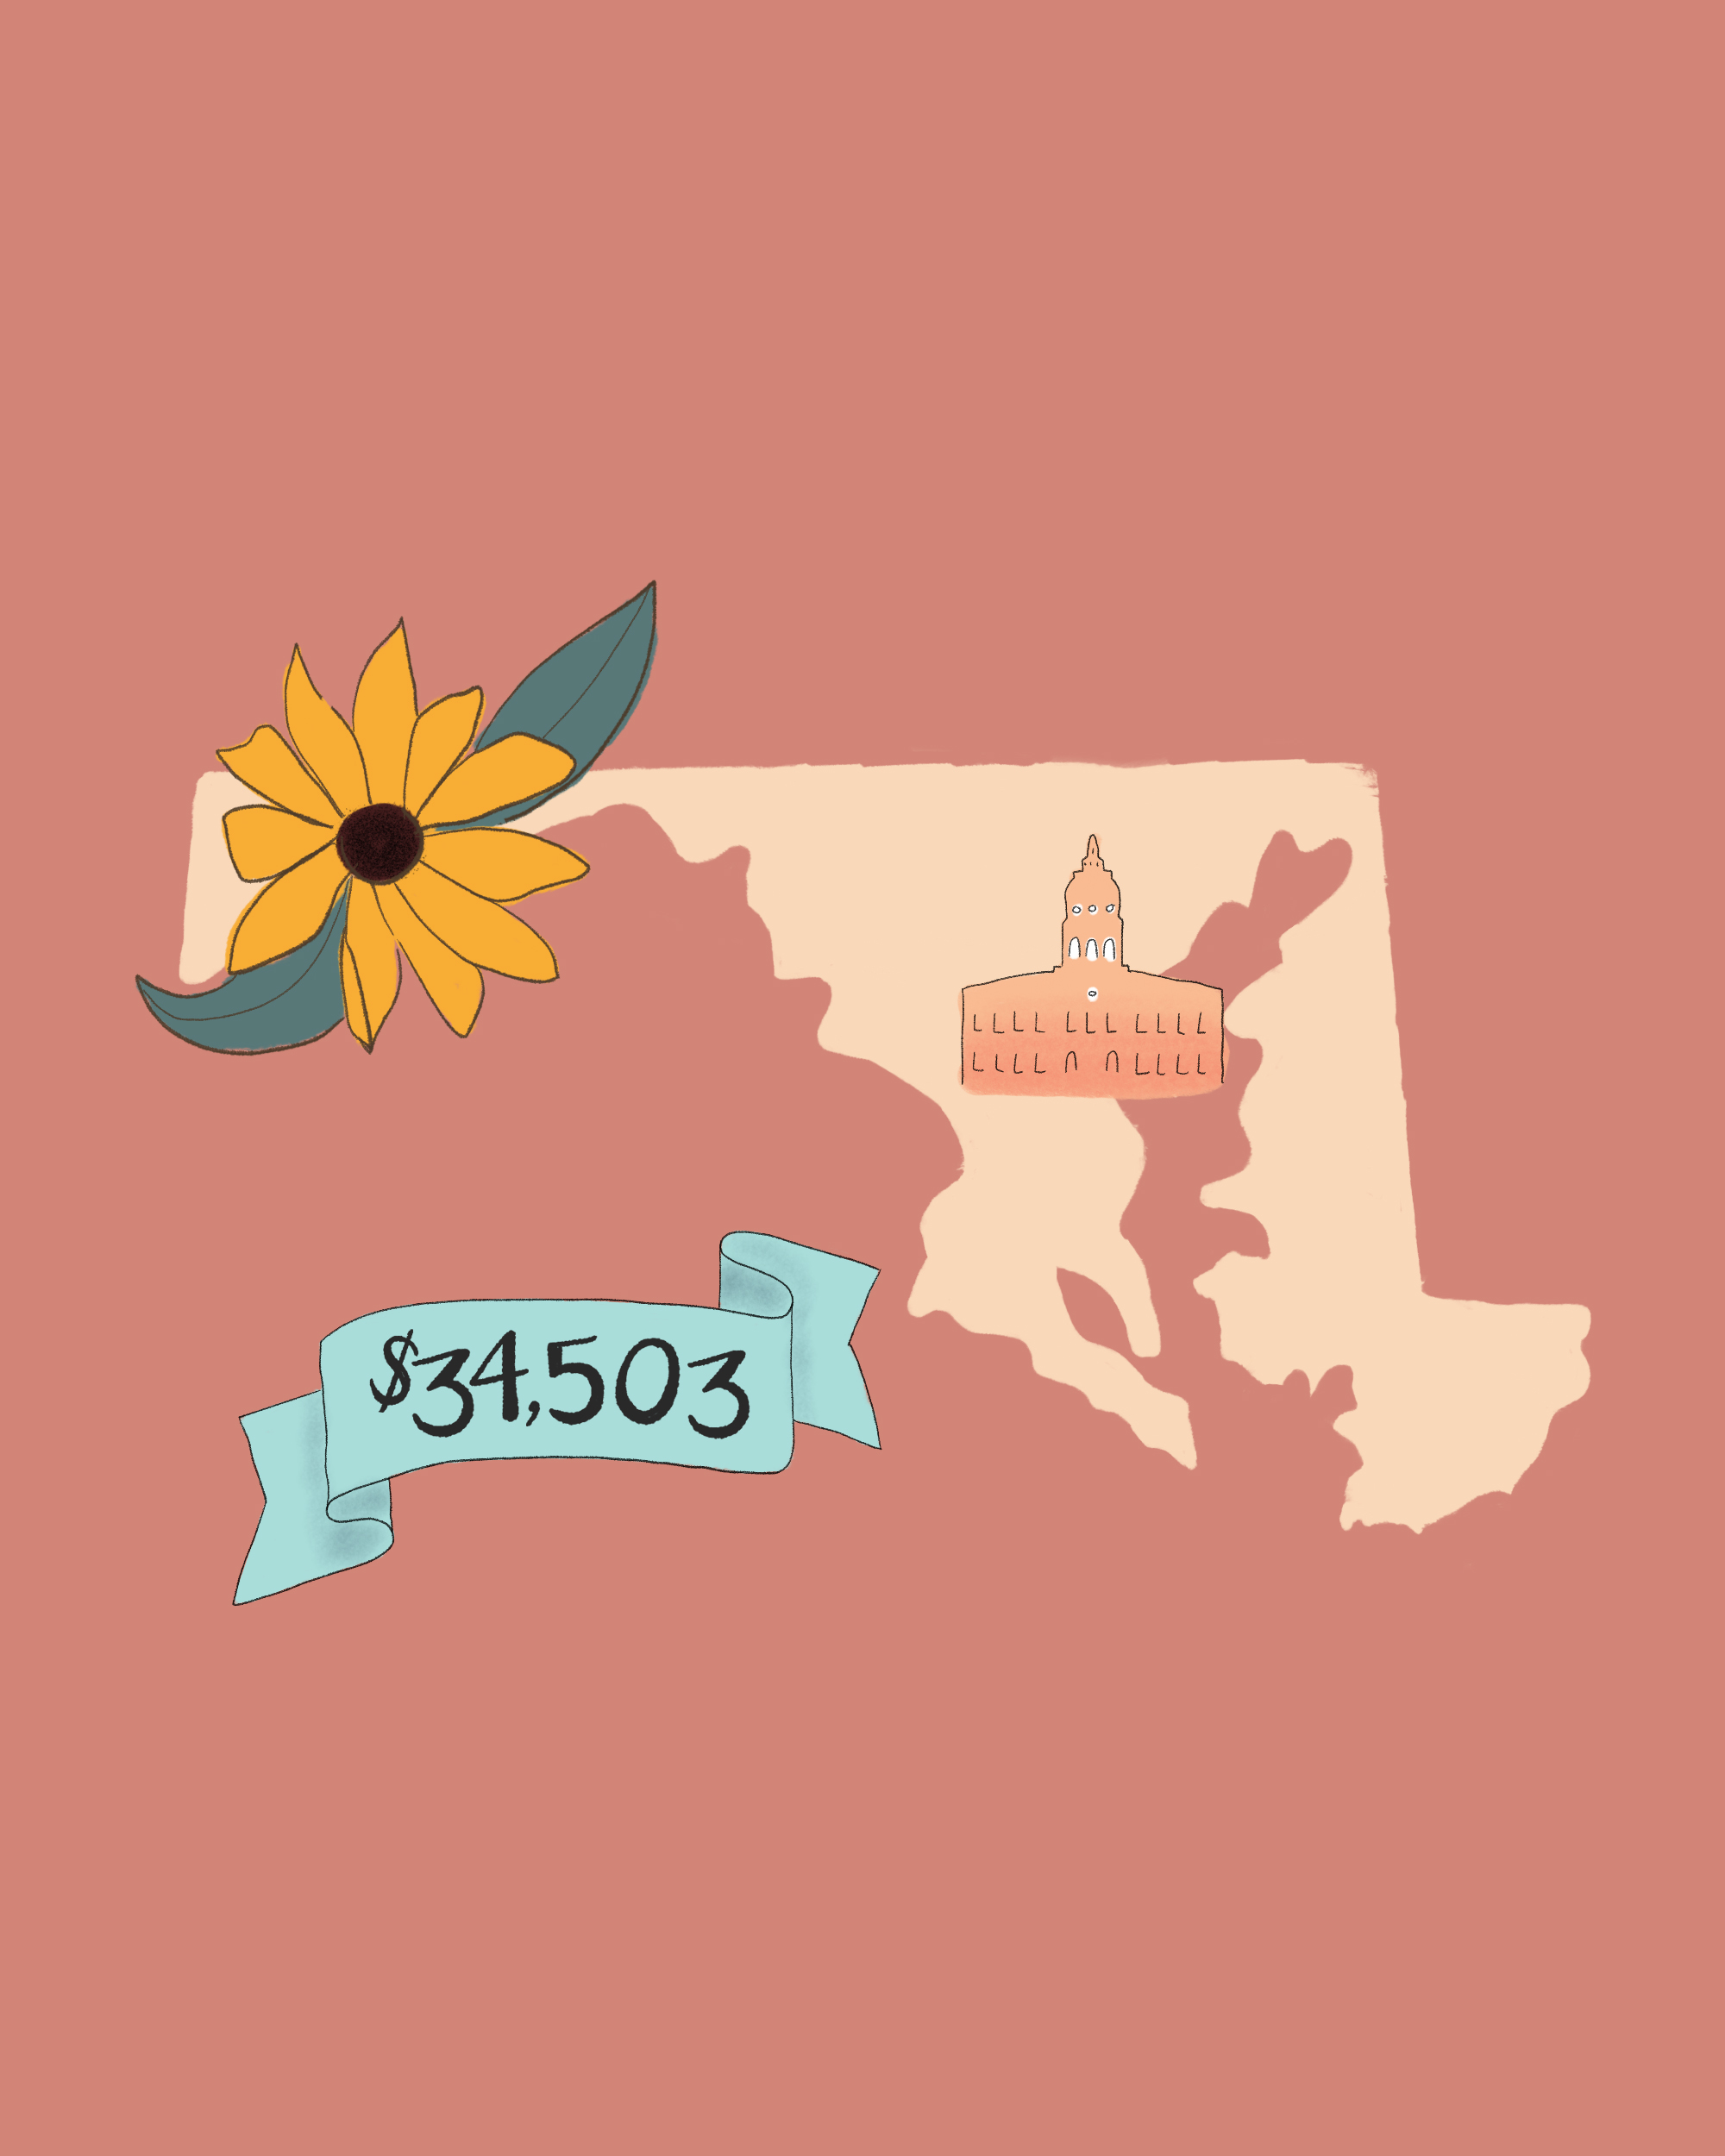 state wedding costs illustration maryland